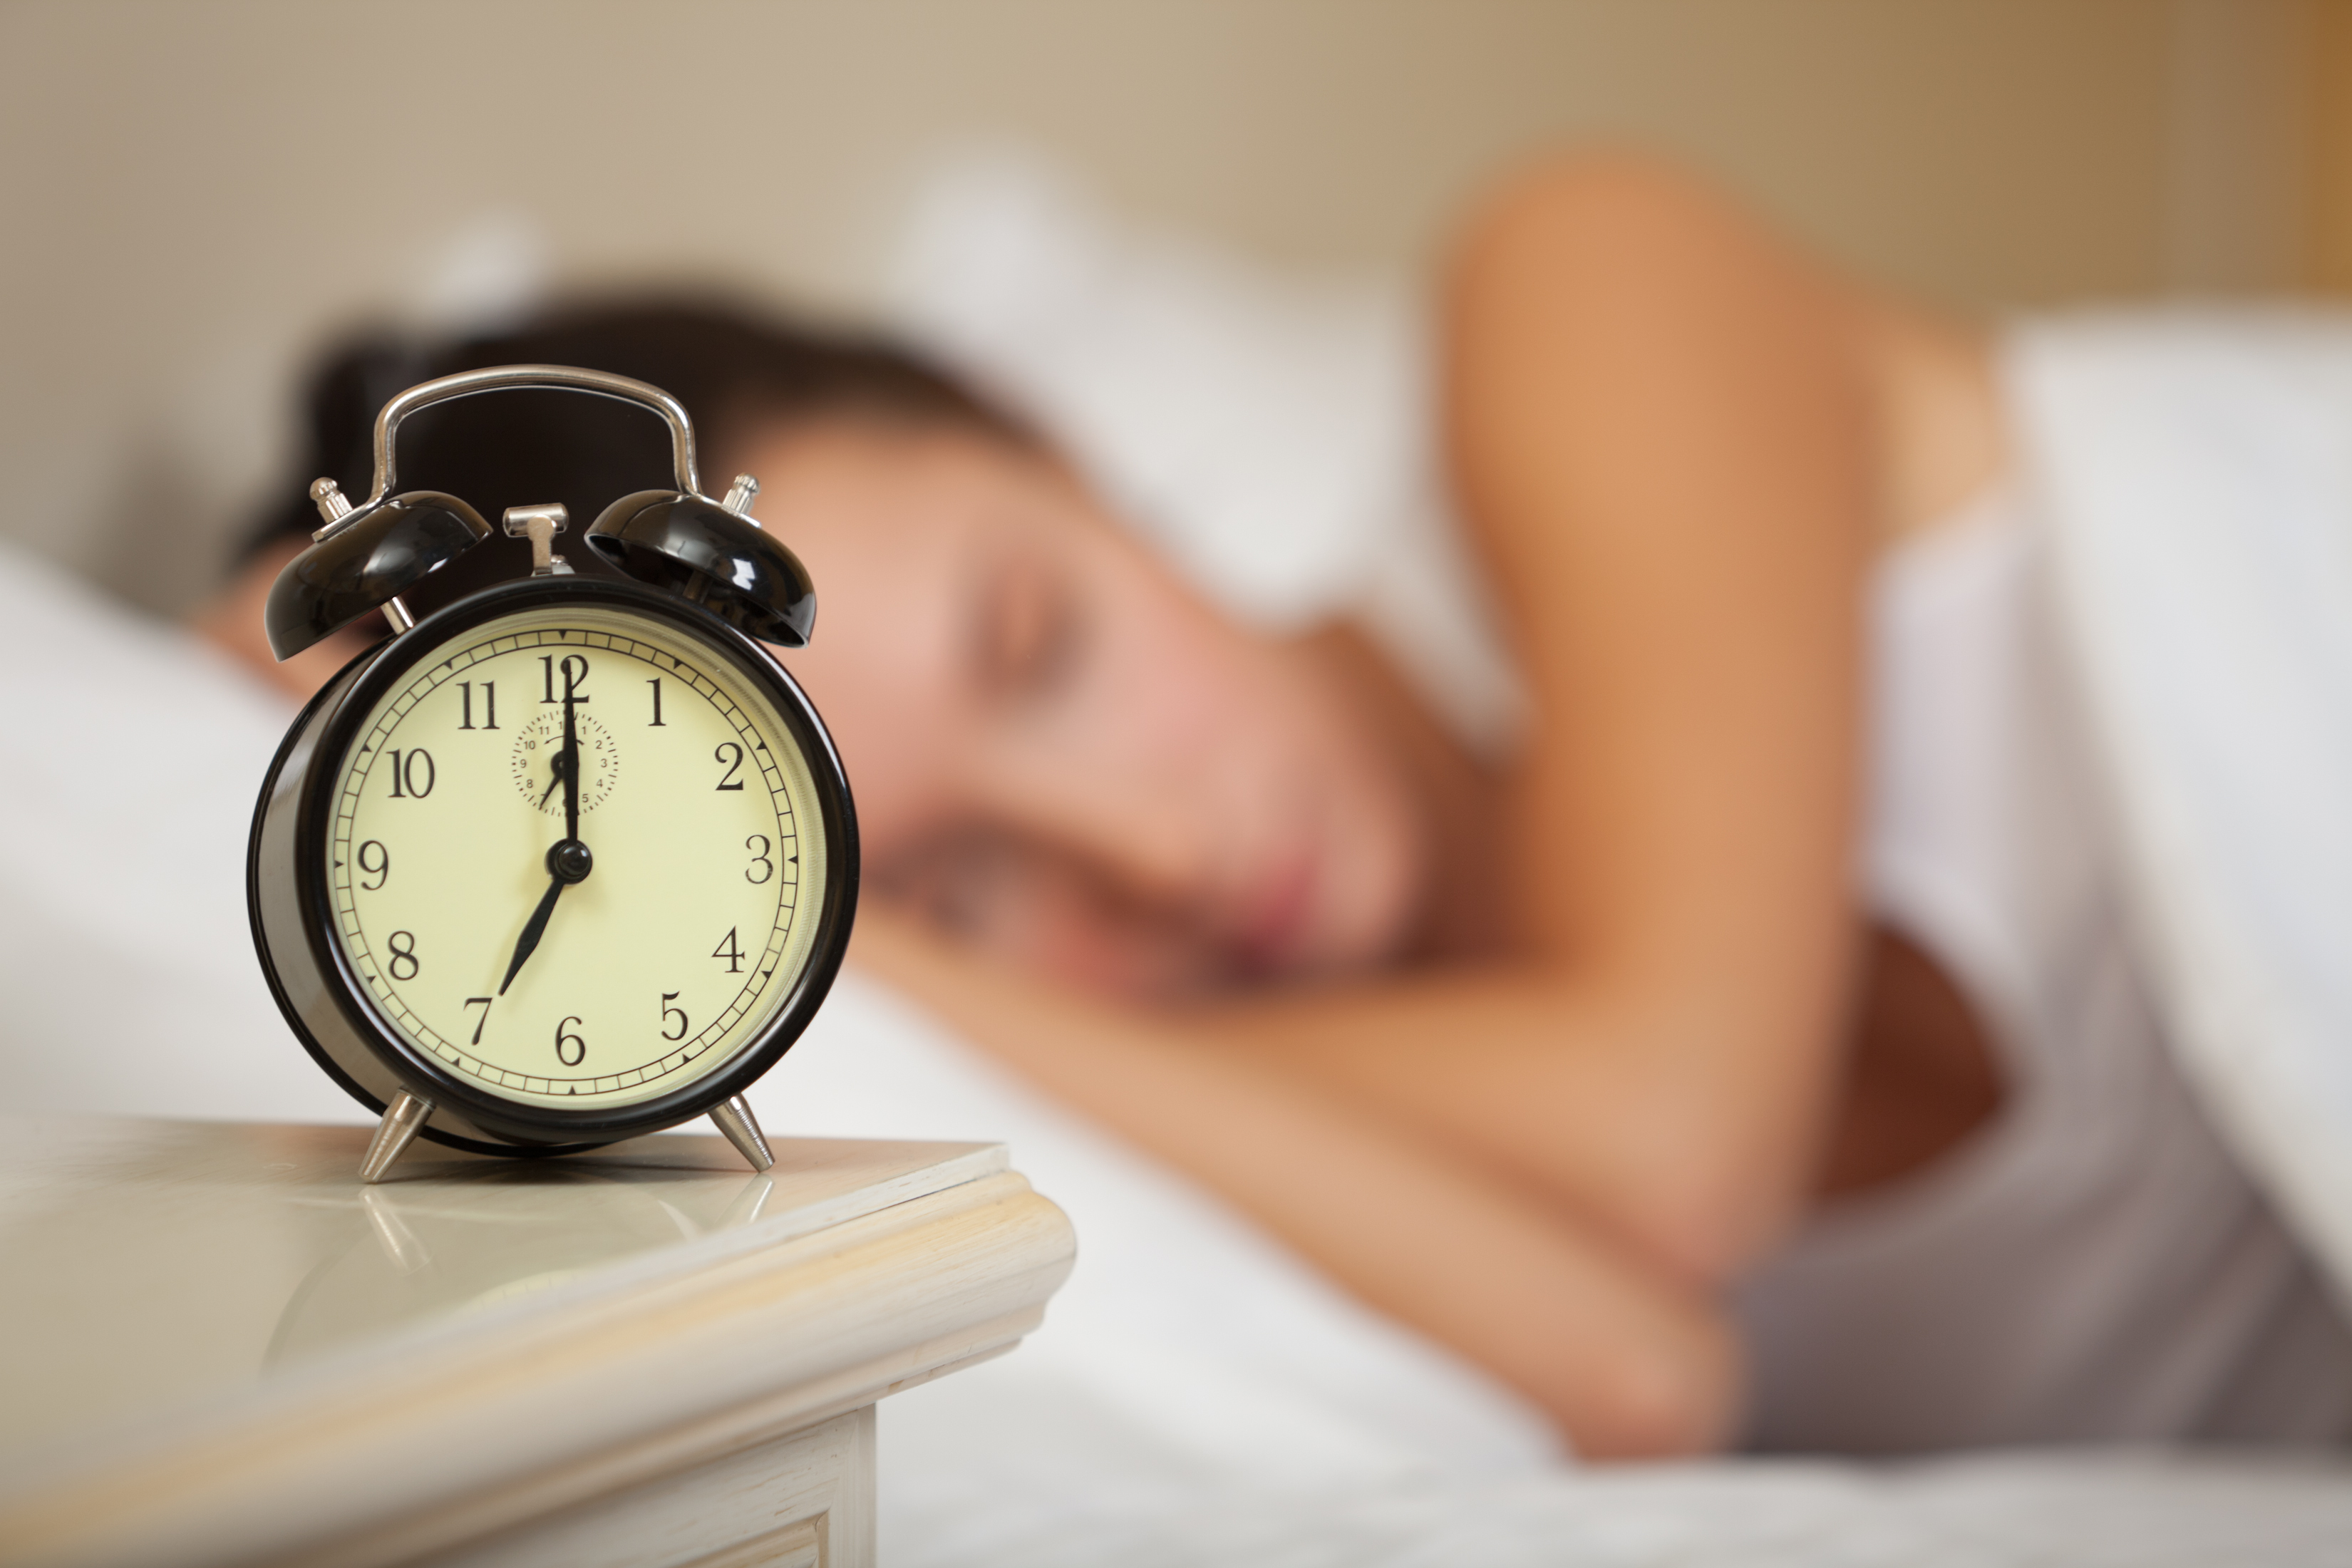 sleeping-woman-and-alarm-clock-bedroom-home.jpg